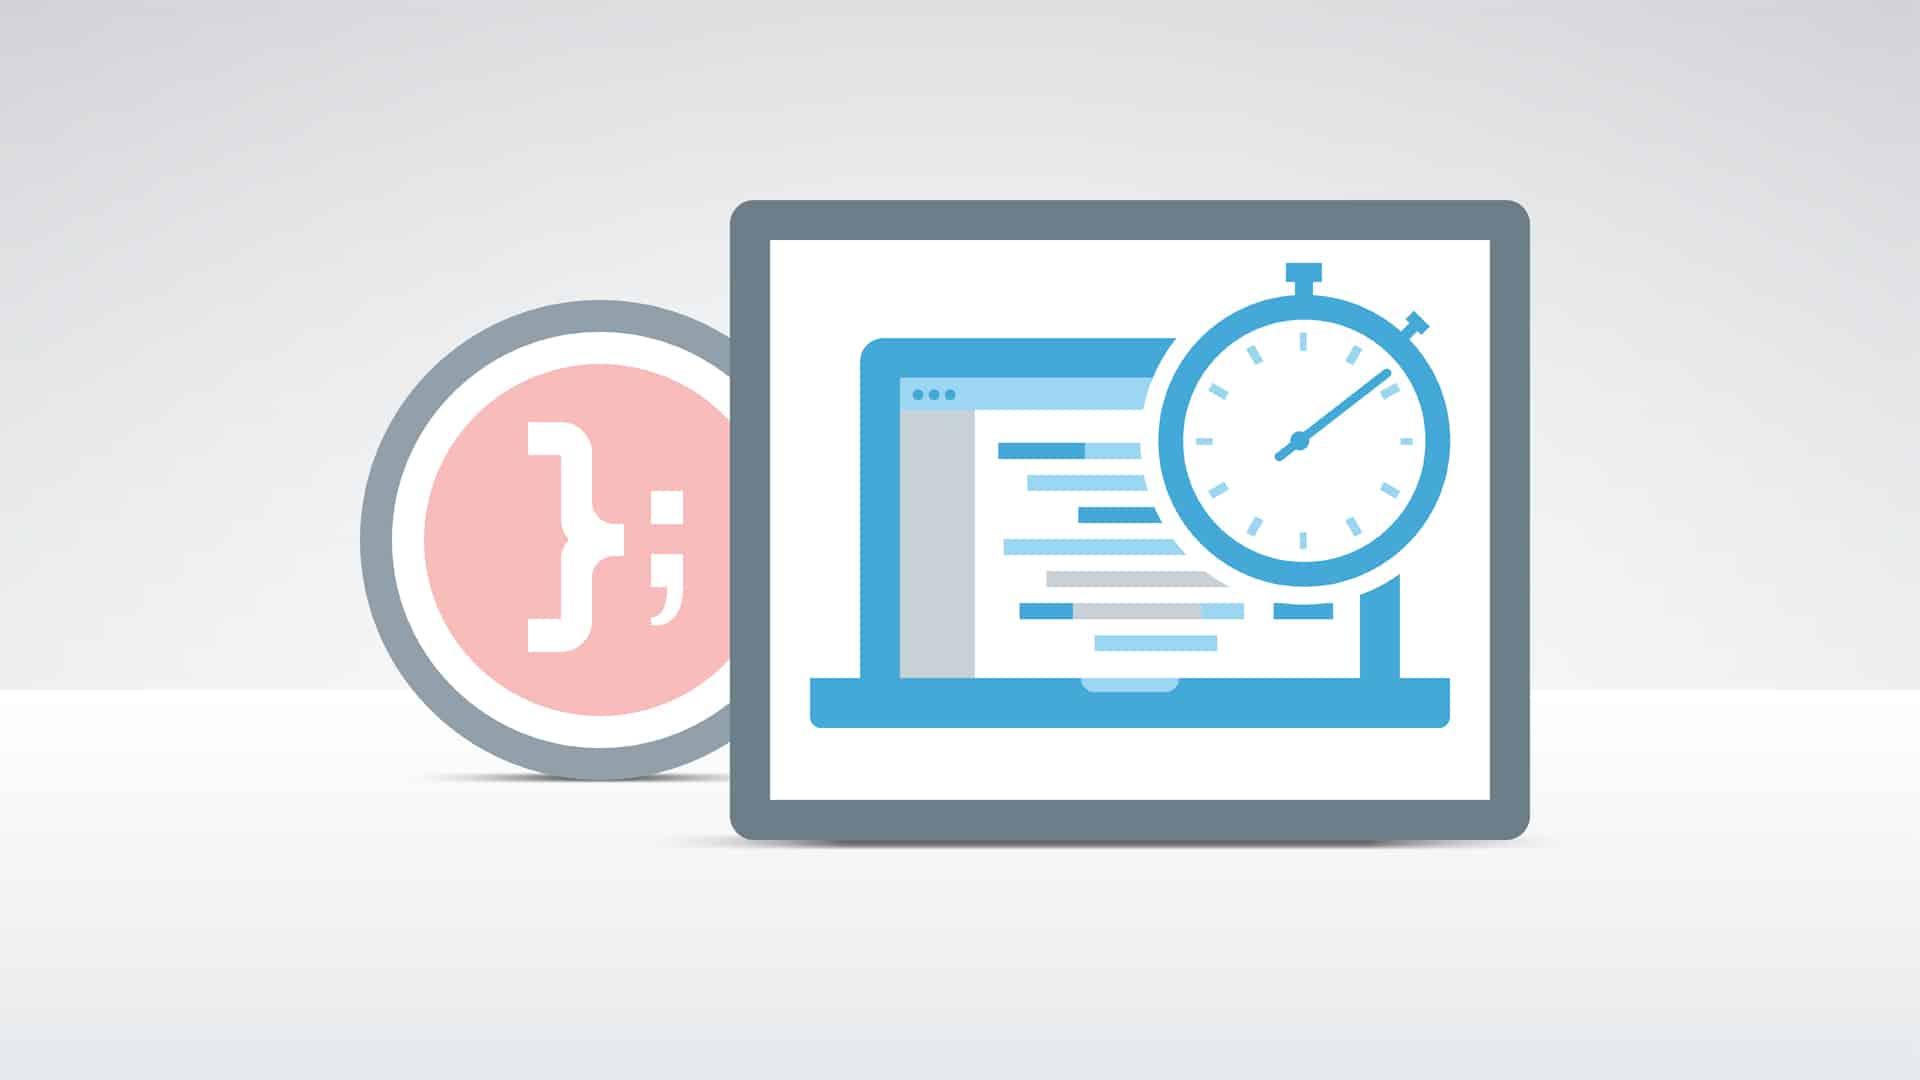 [Lynda] Advanced Express: Web Application Development